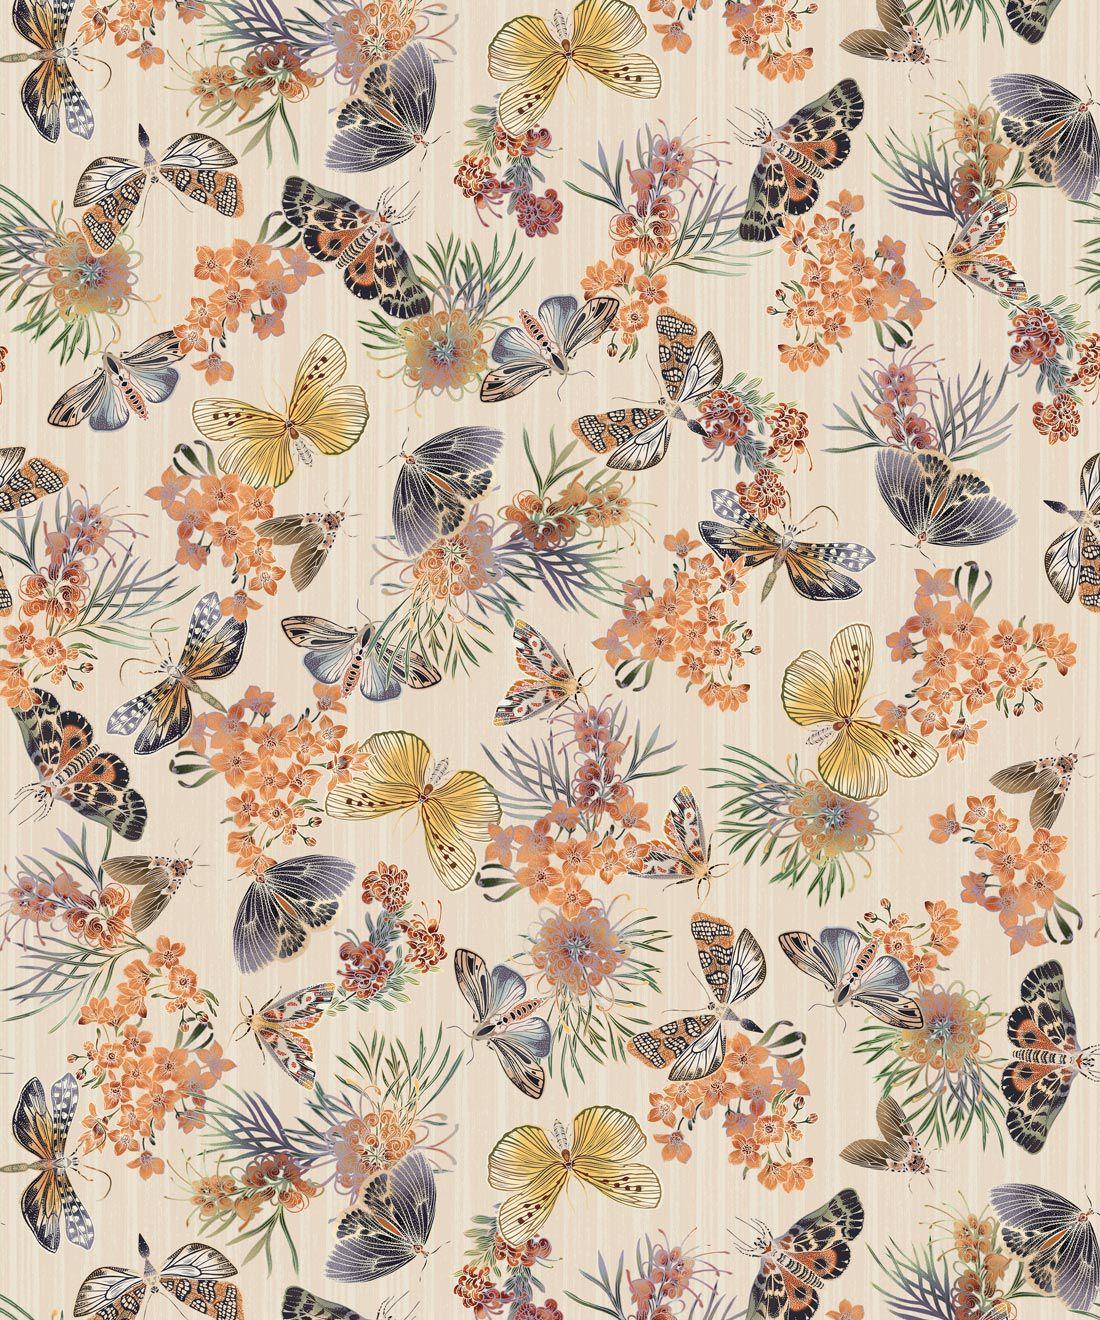 Moth Wallpaper • Eloise Short • Vintage Floral Wallpaper •Granny Chic Wallpaper • Grandmillennial Style Wallpaper •Ivory •Swatch